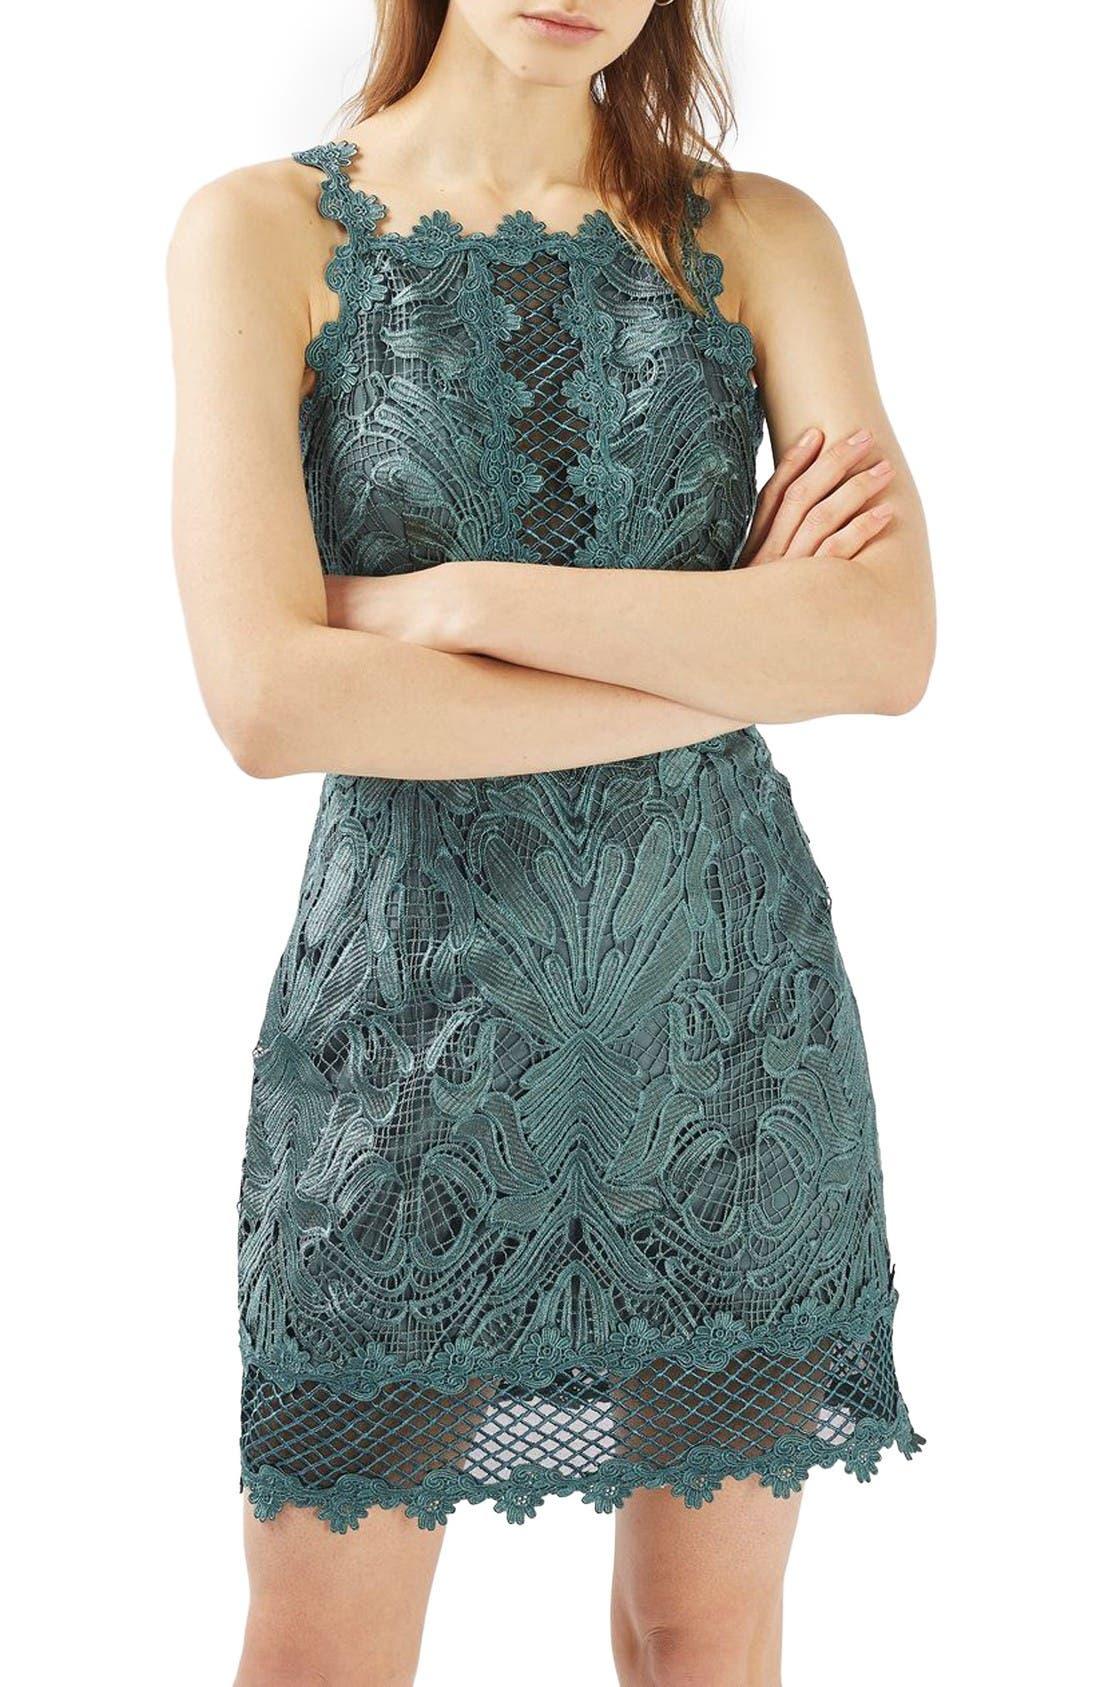 Alternate Image 1 Selected - Topshop Lace Detail Sleeveless A-Line Dress (Regular & Petite)